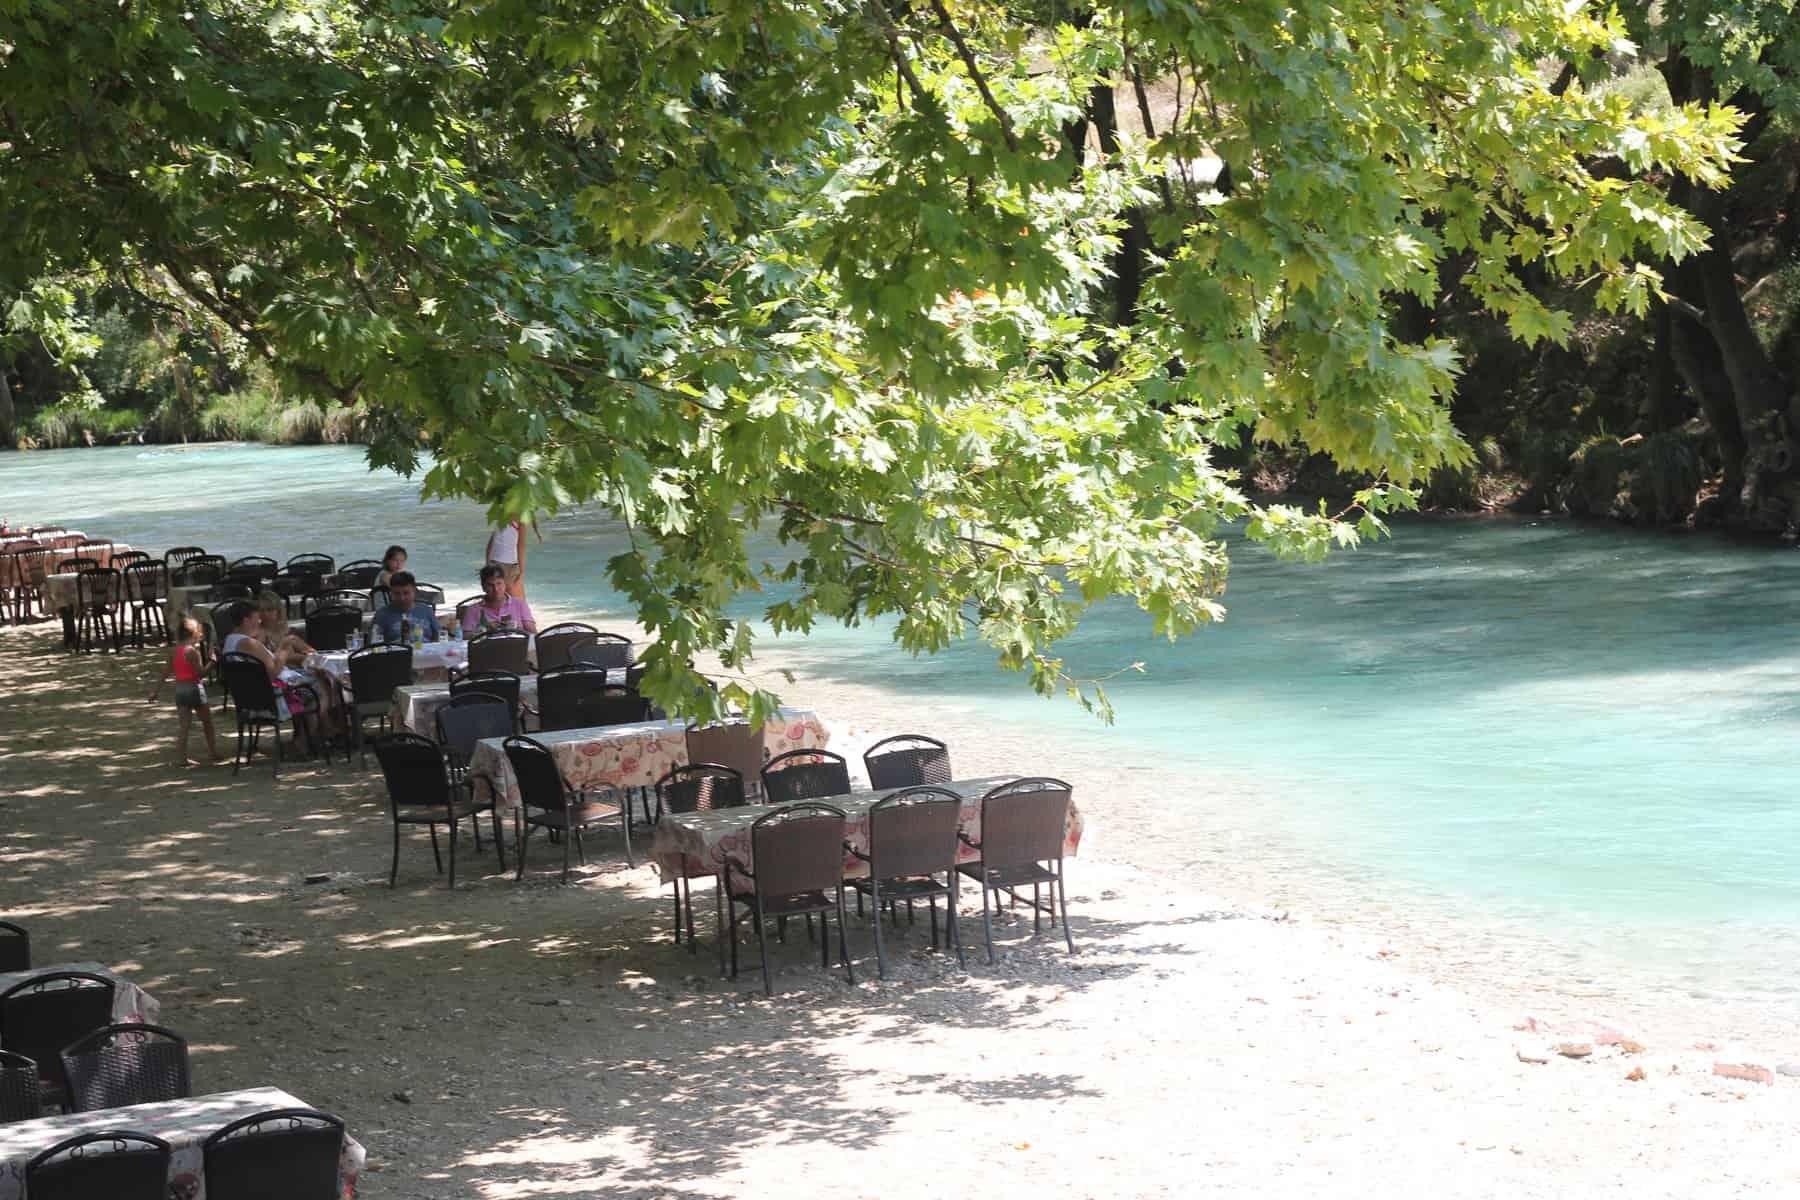 river, flod, greece, grekland, hiking, vandra